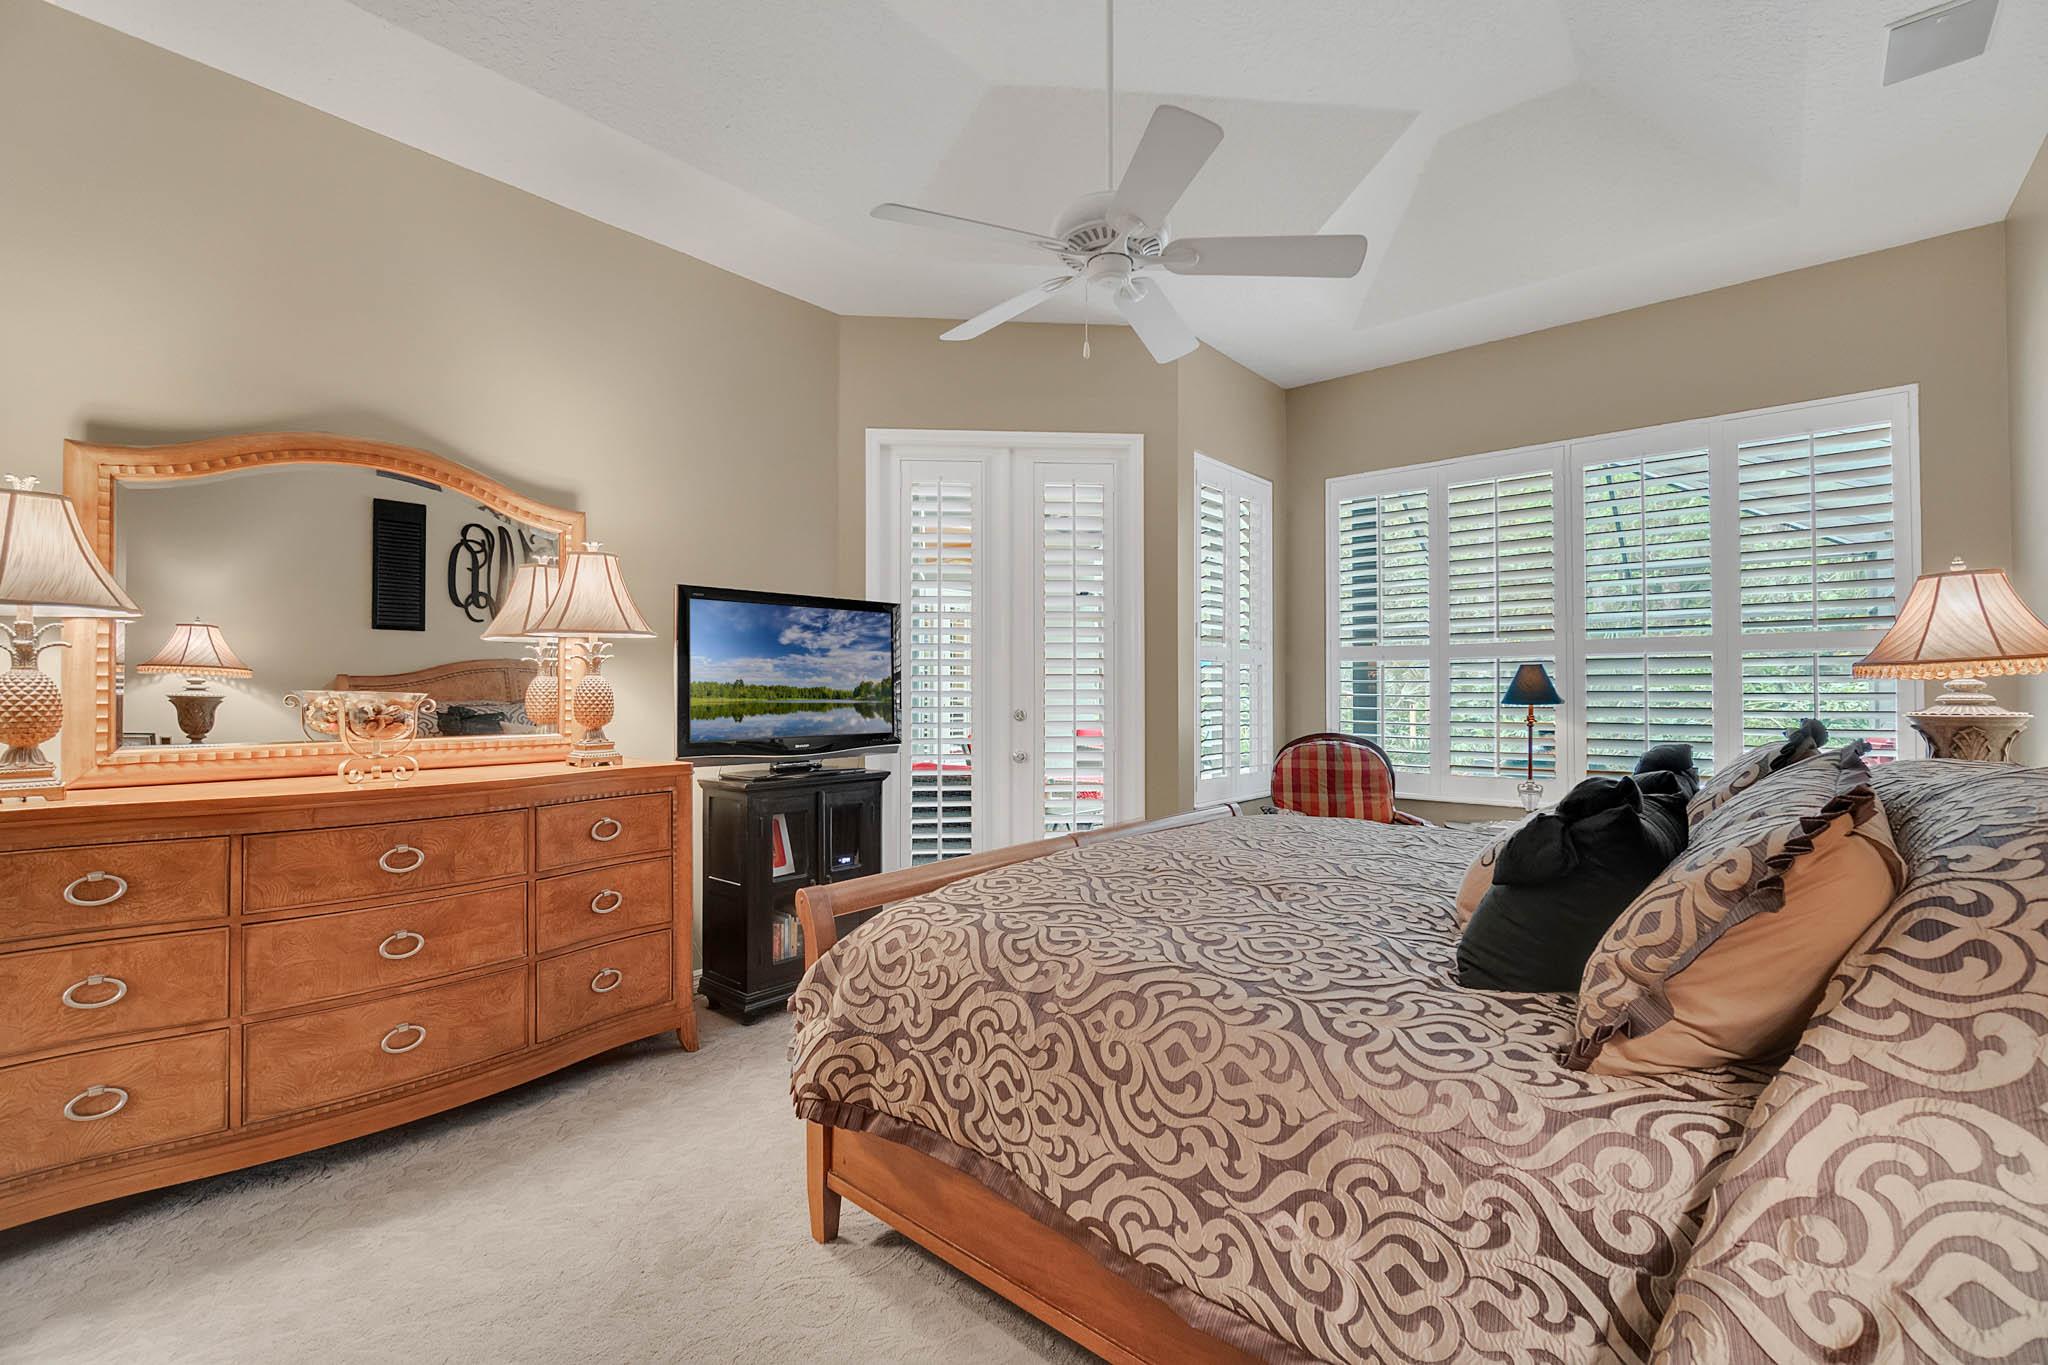 429-Fawn-Hill-Pl--Sanford--FL-32771----28---Master-Bedroom.jpg